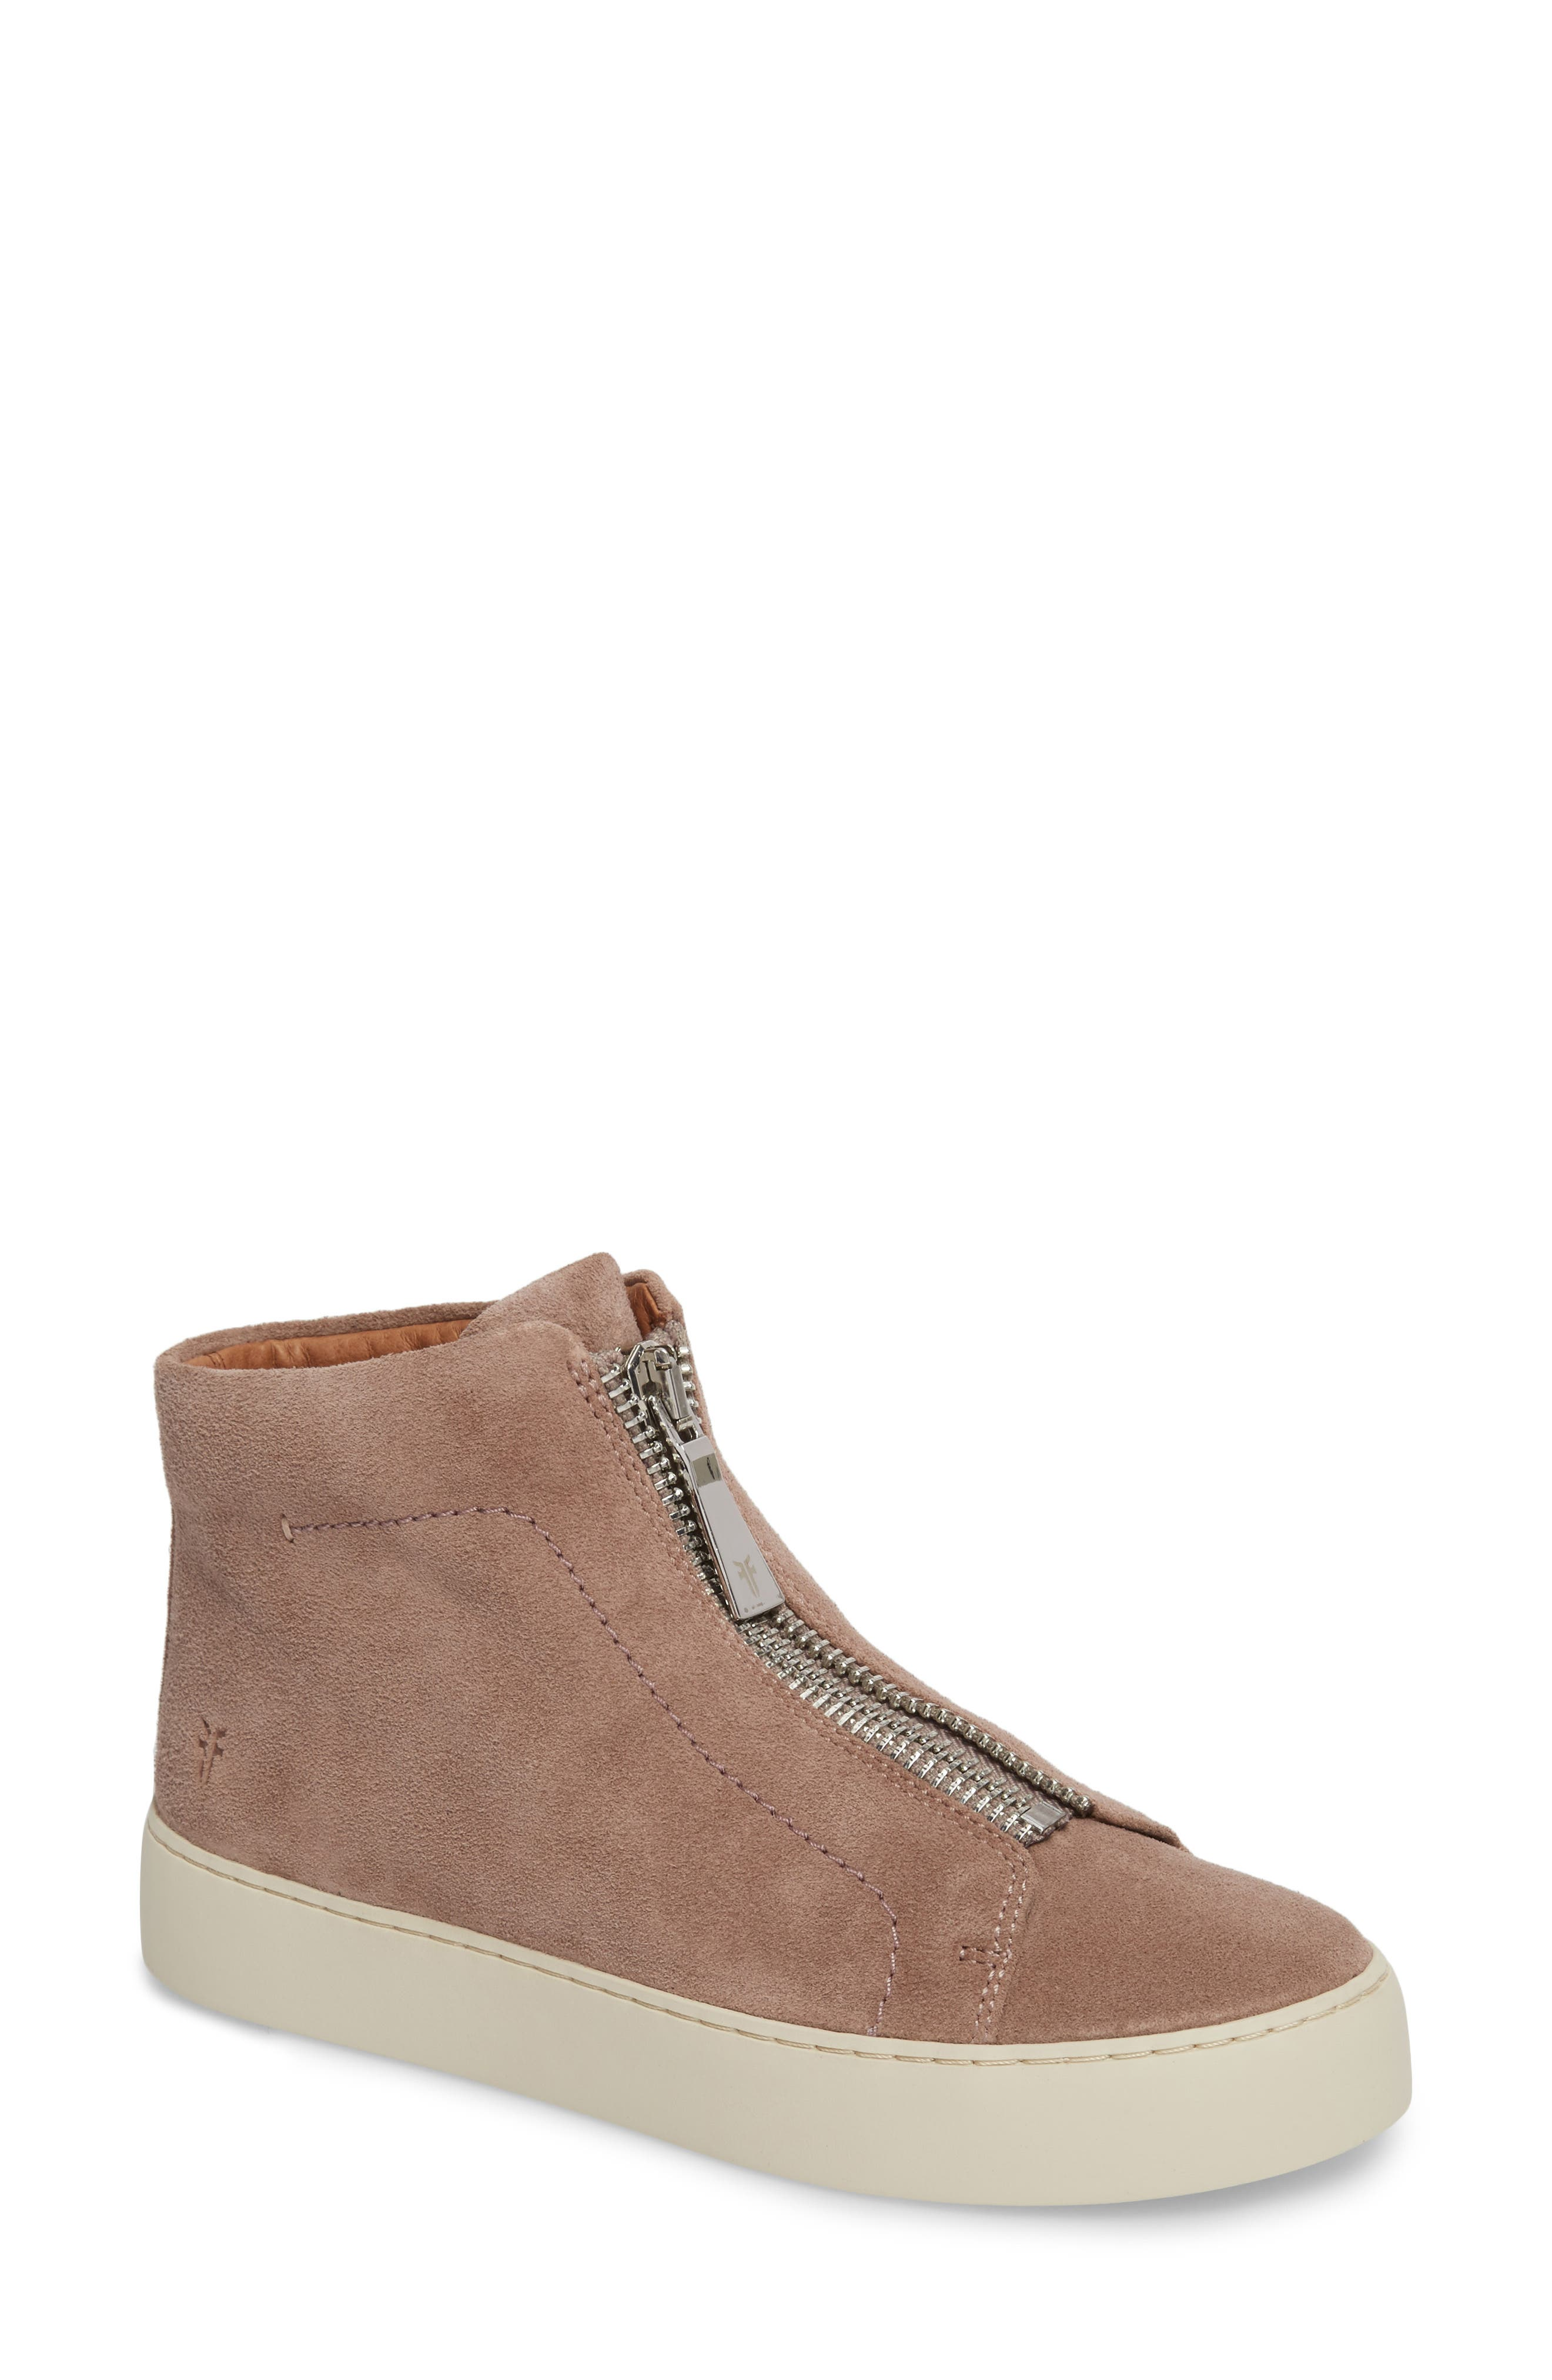 Lena Zip High Top Sneaker,                         Main,                         color, Dusty Rose Suede